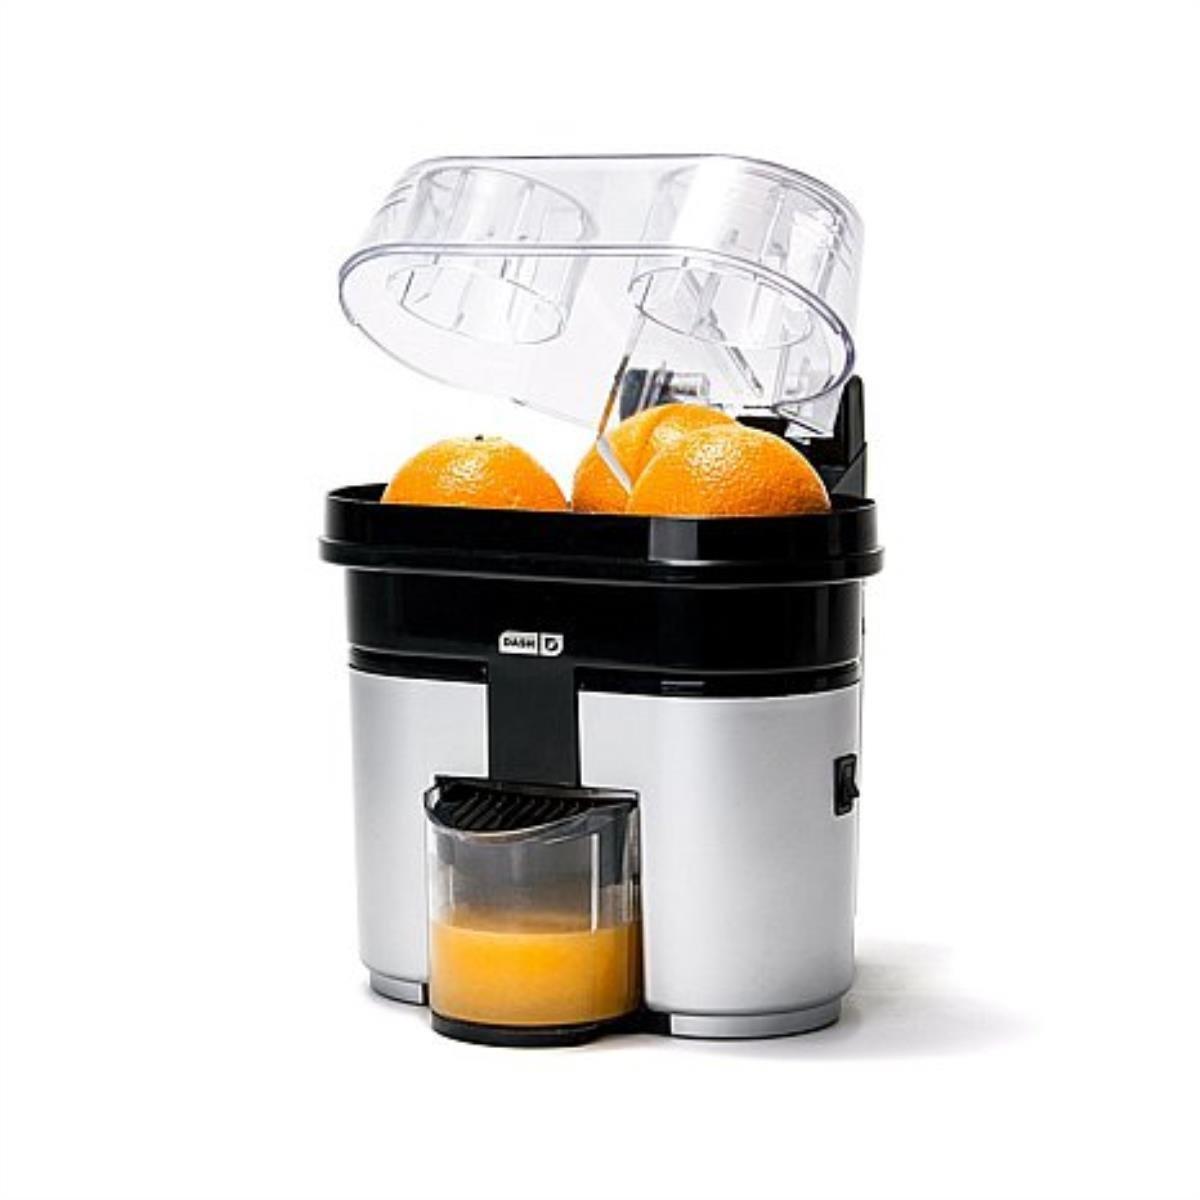 Dash Dual Citrus Juicer with Built-in slicer